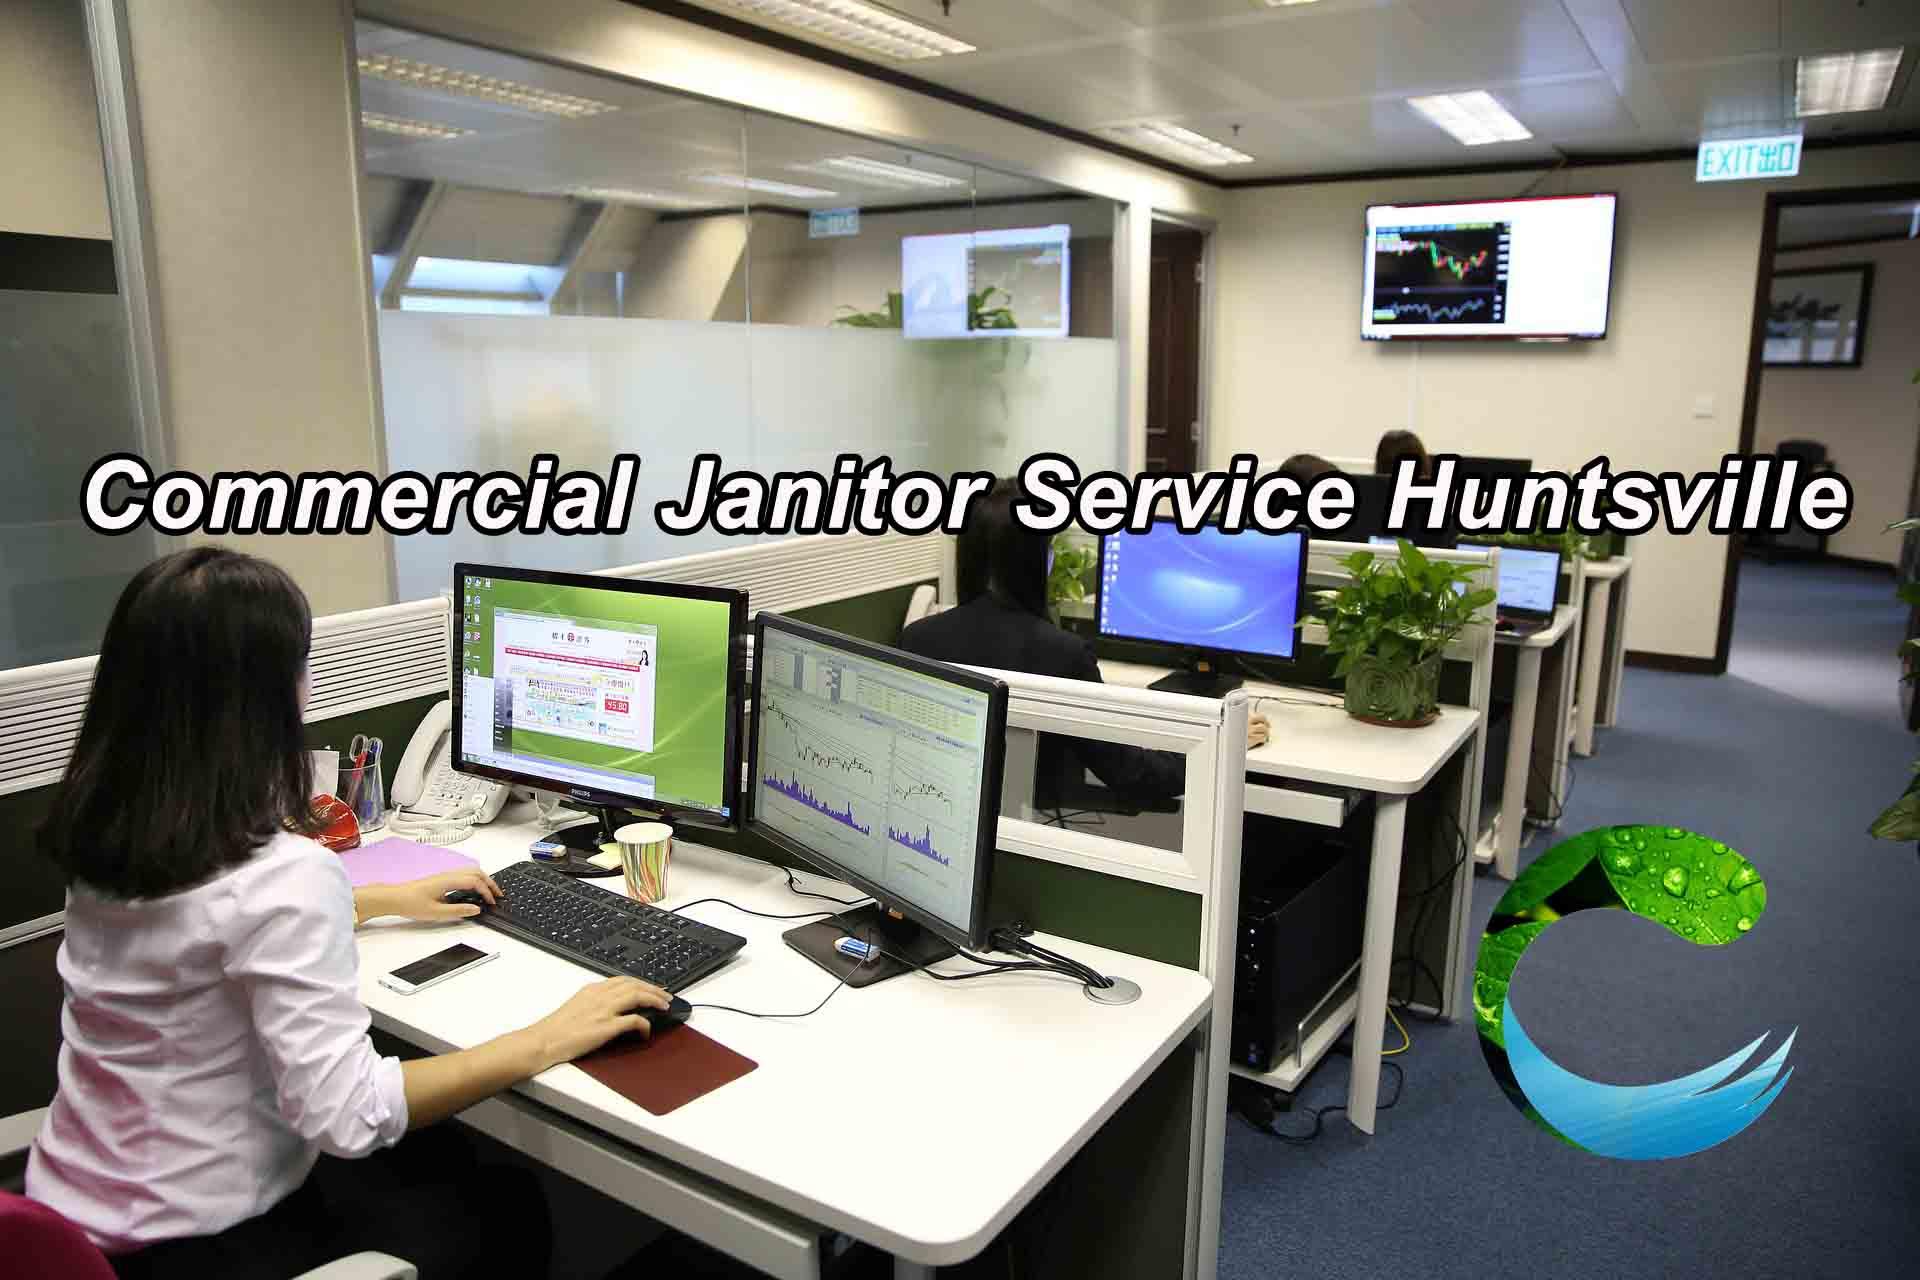 Commercial Janitor Service Huntsville